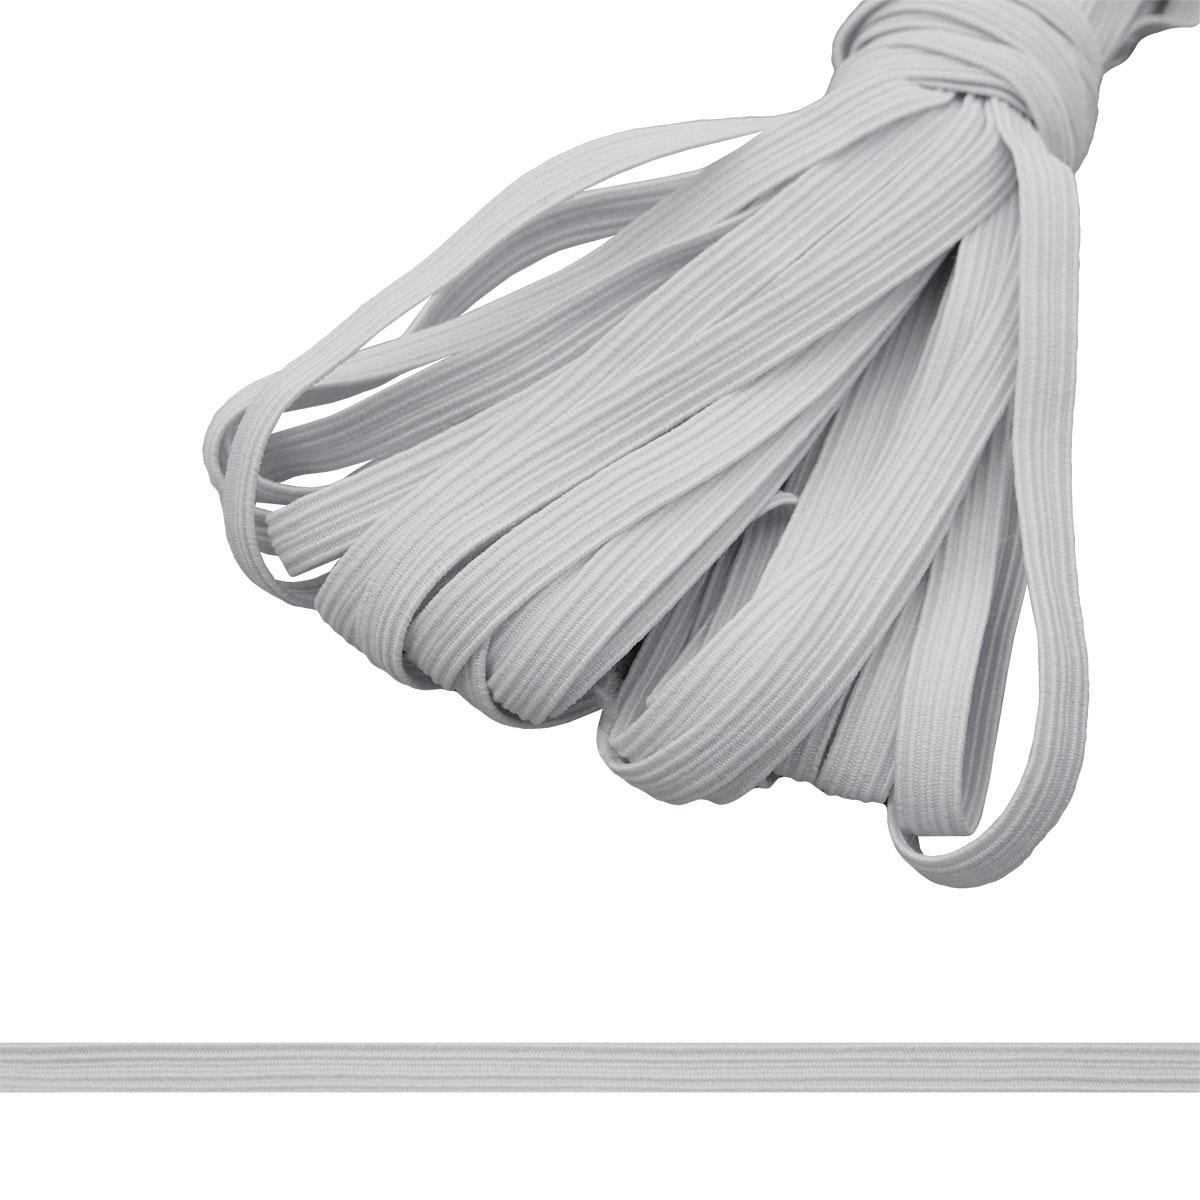 Тесьма эластичная, 7 мм (10*10 м), белый